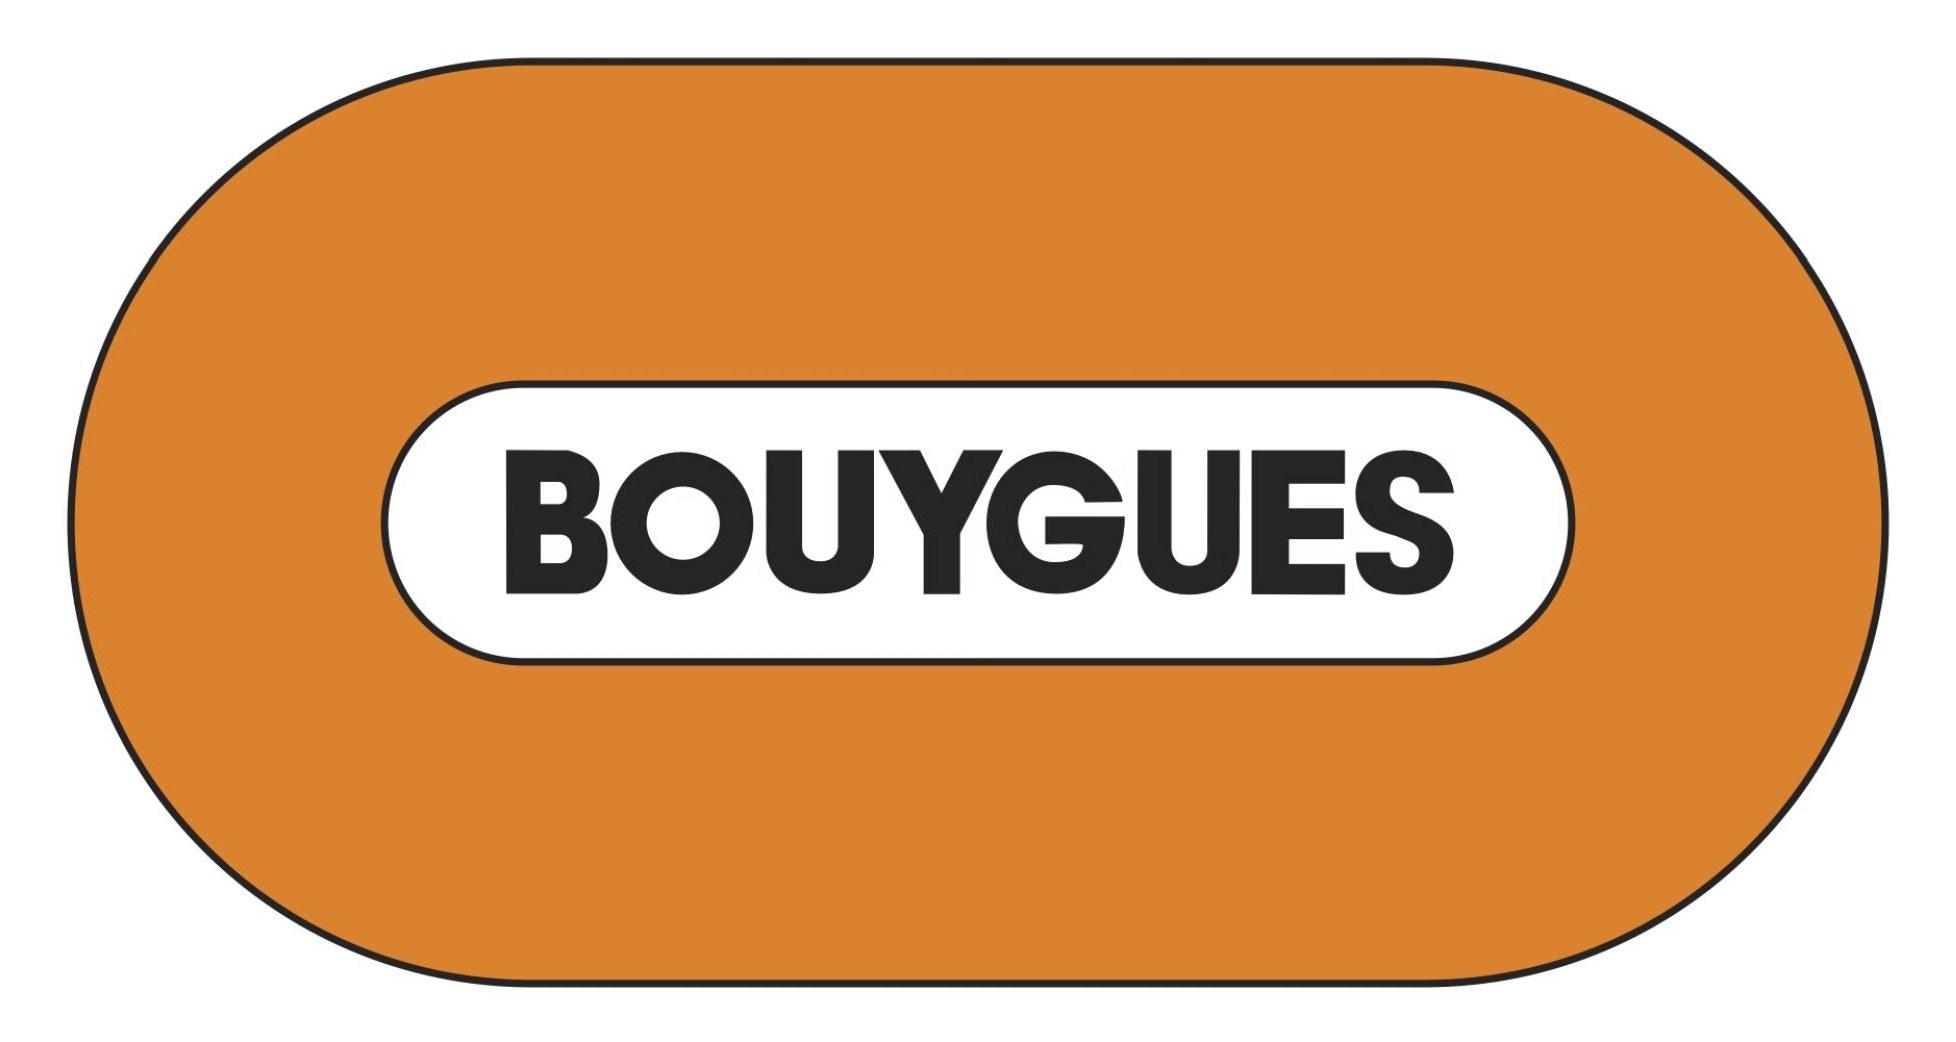 bouygues logo vector